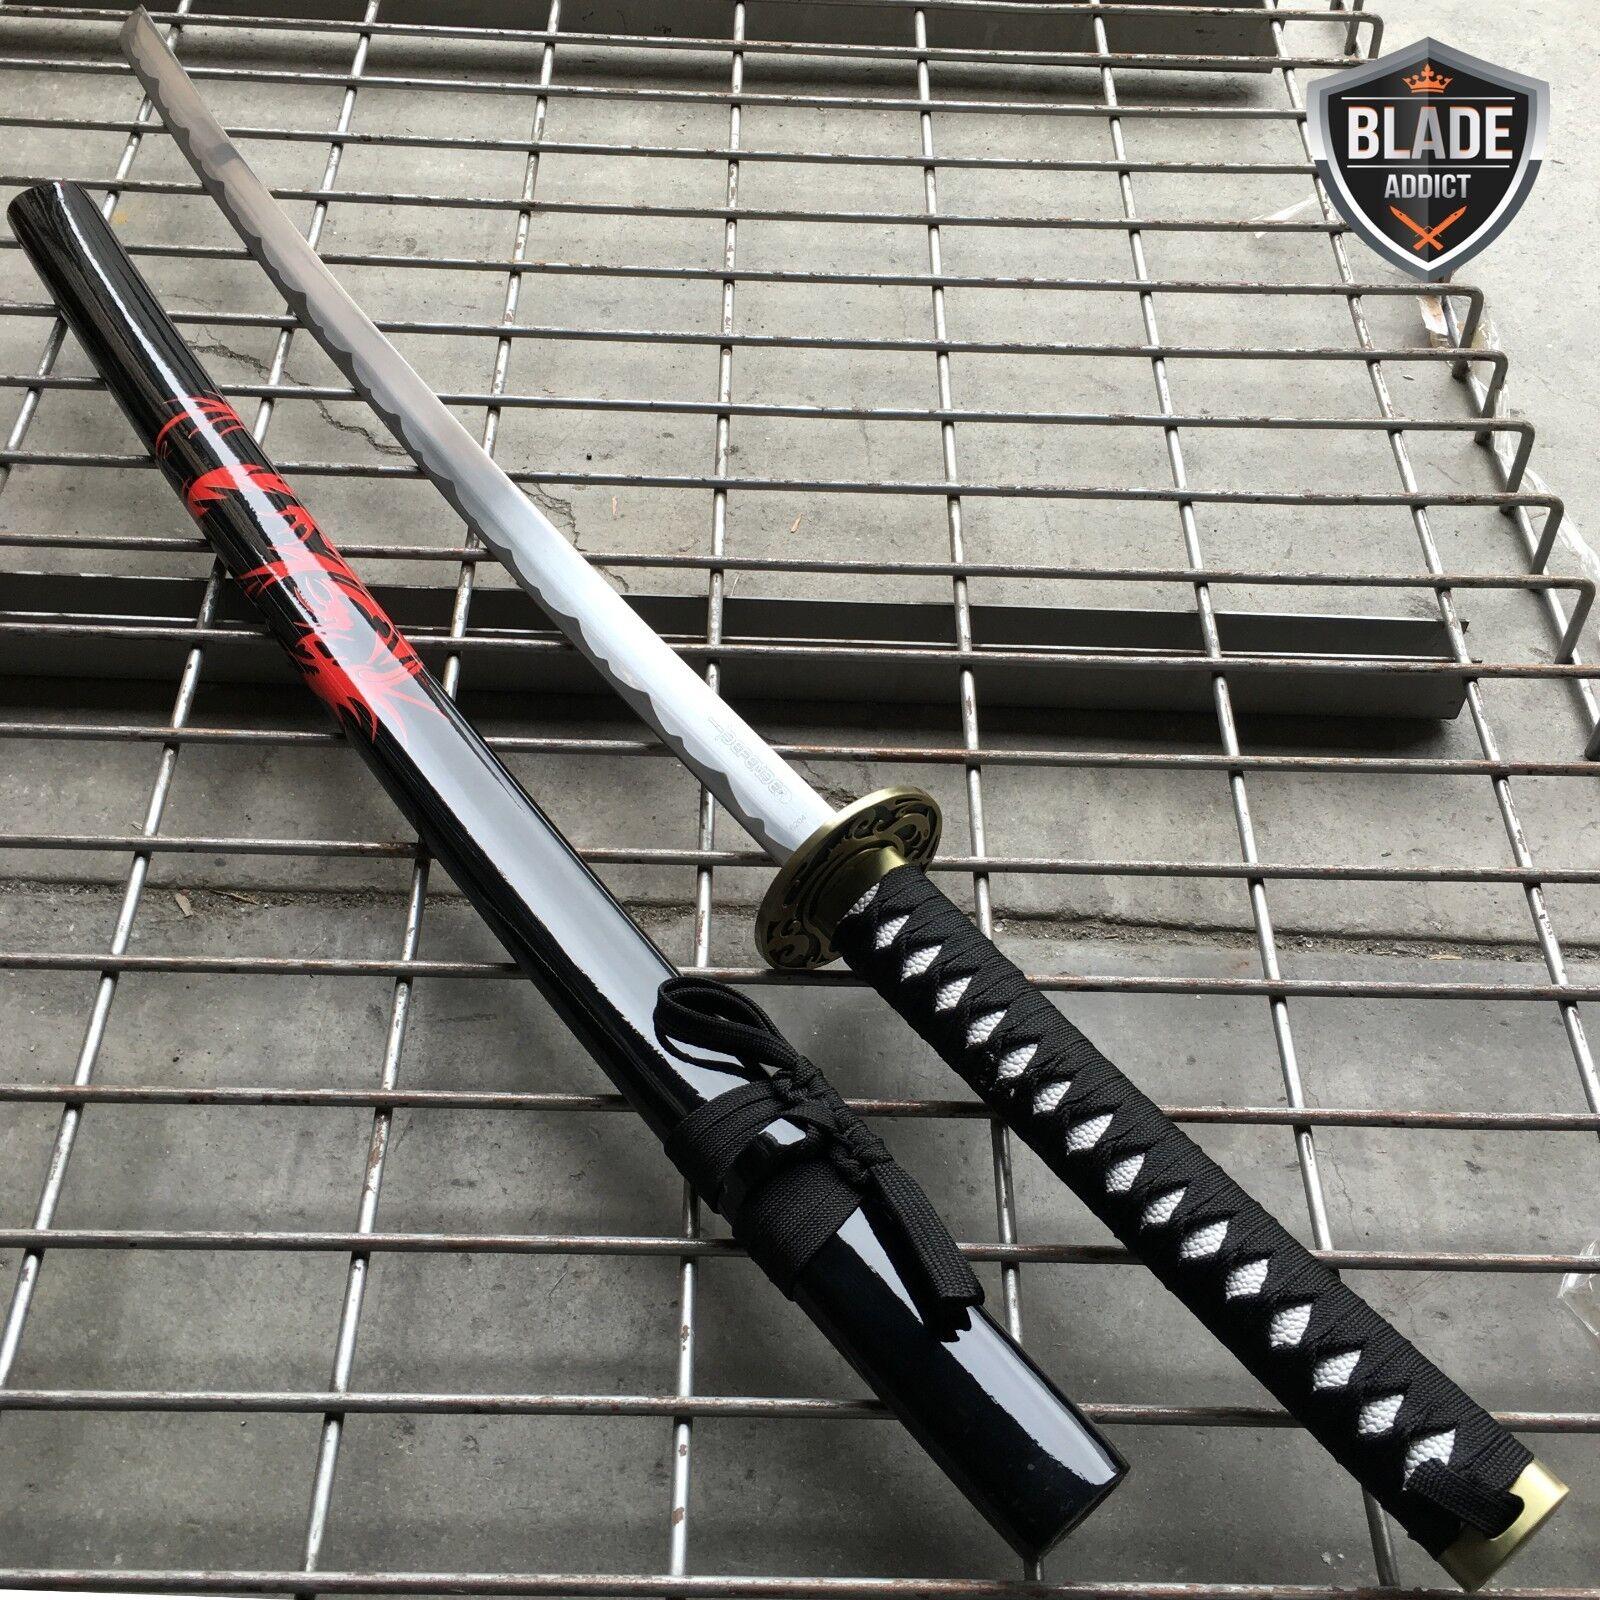 Ninja Sword, Samurai Sword Sharp Authentic Japanese Katana ...  |Types Of Ninja Swords